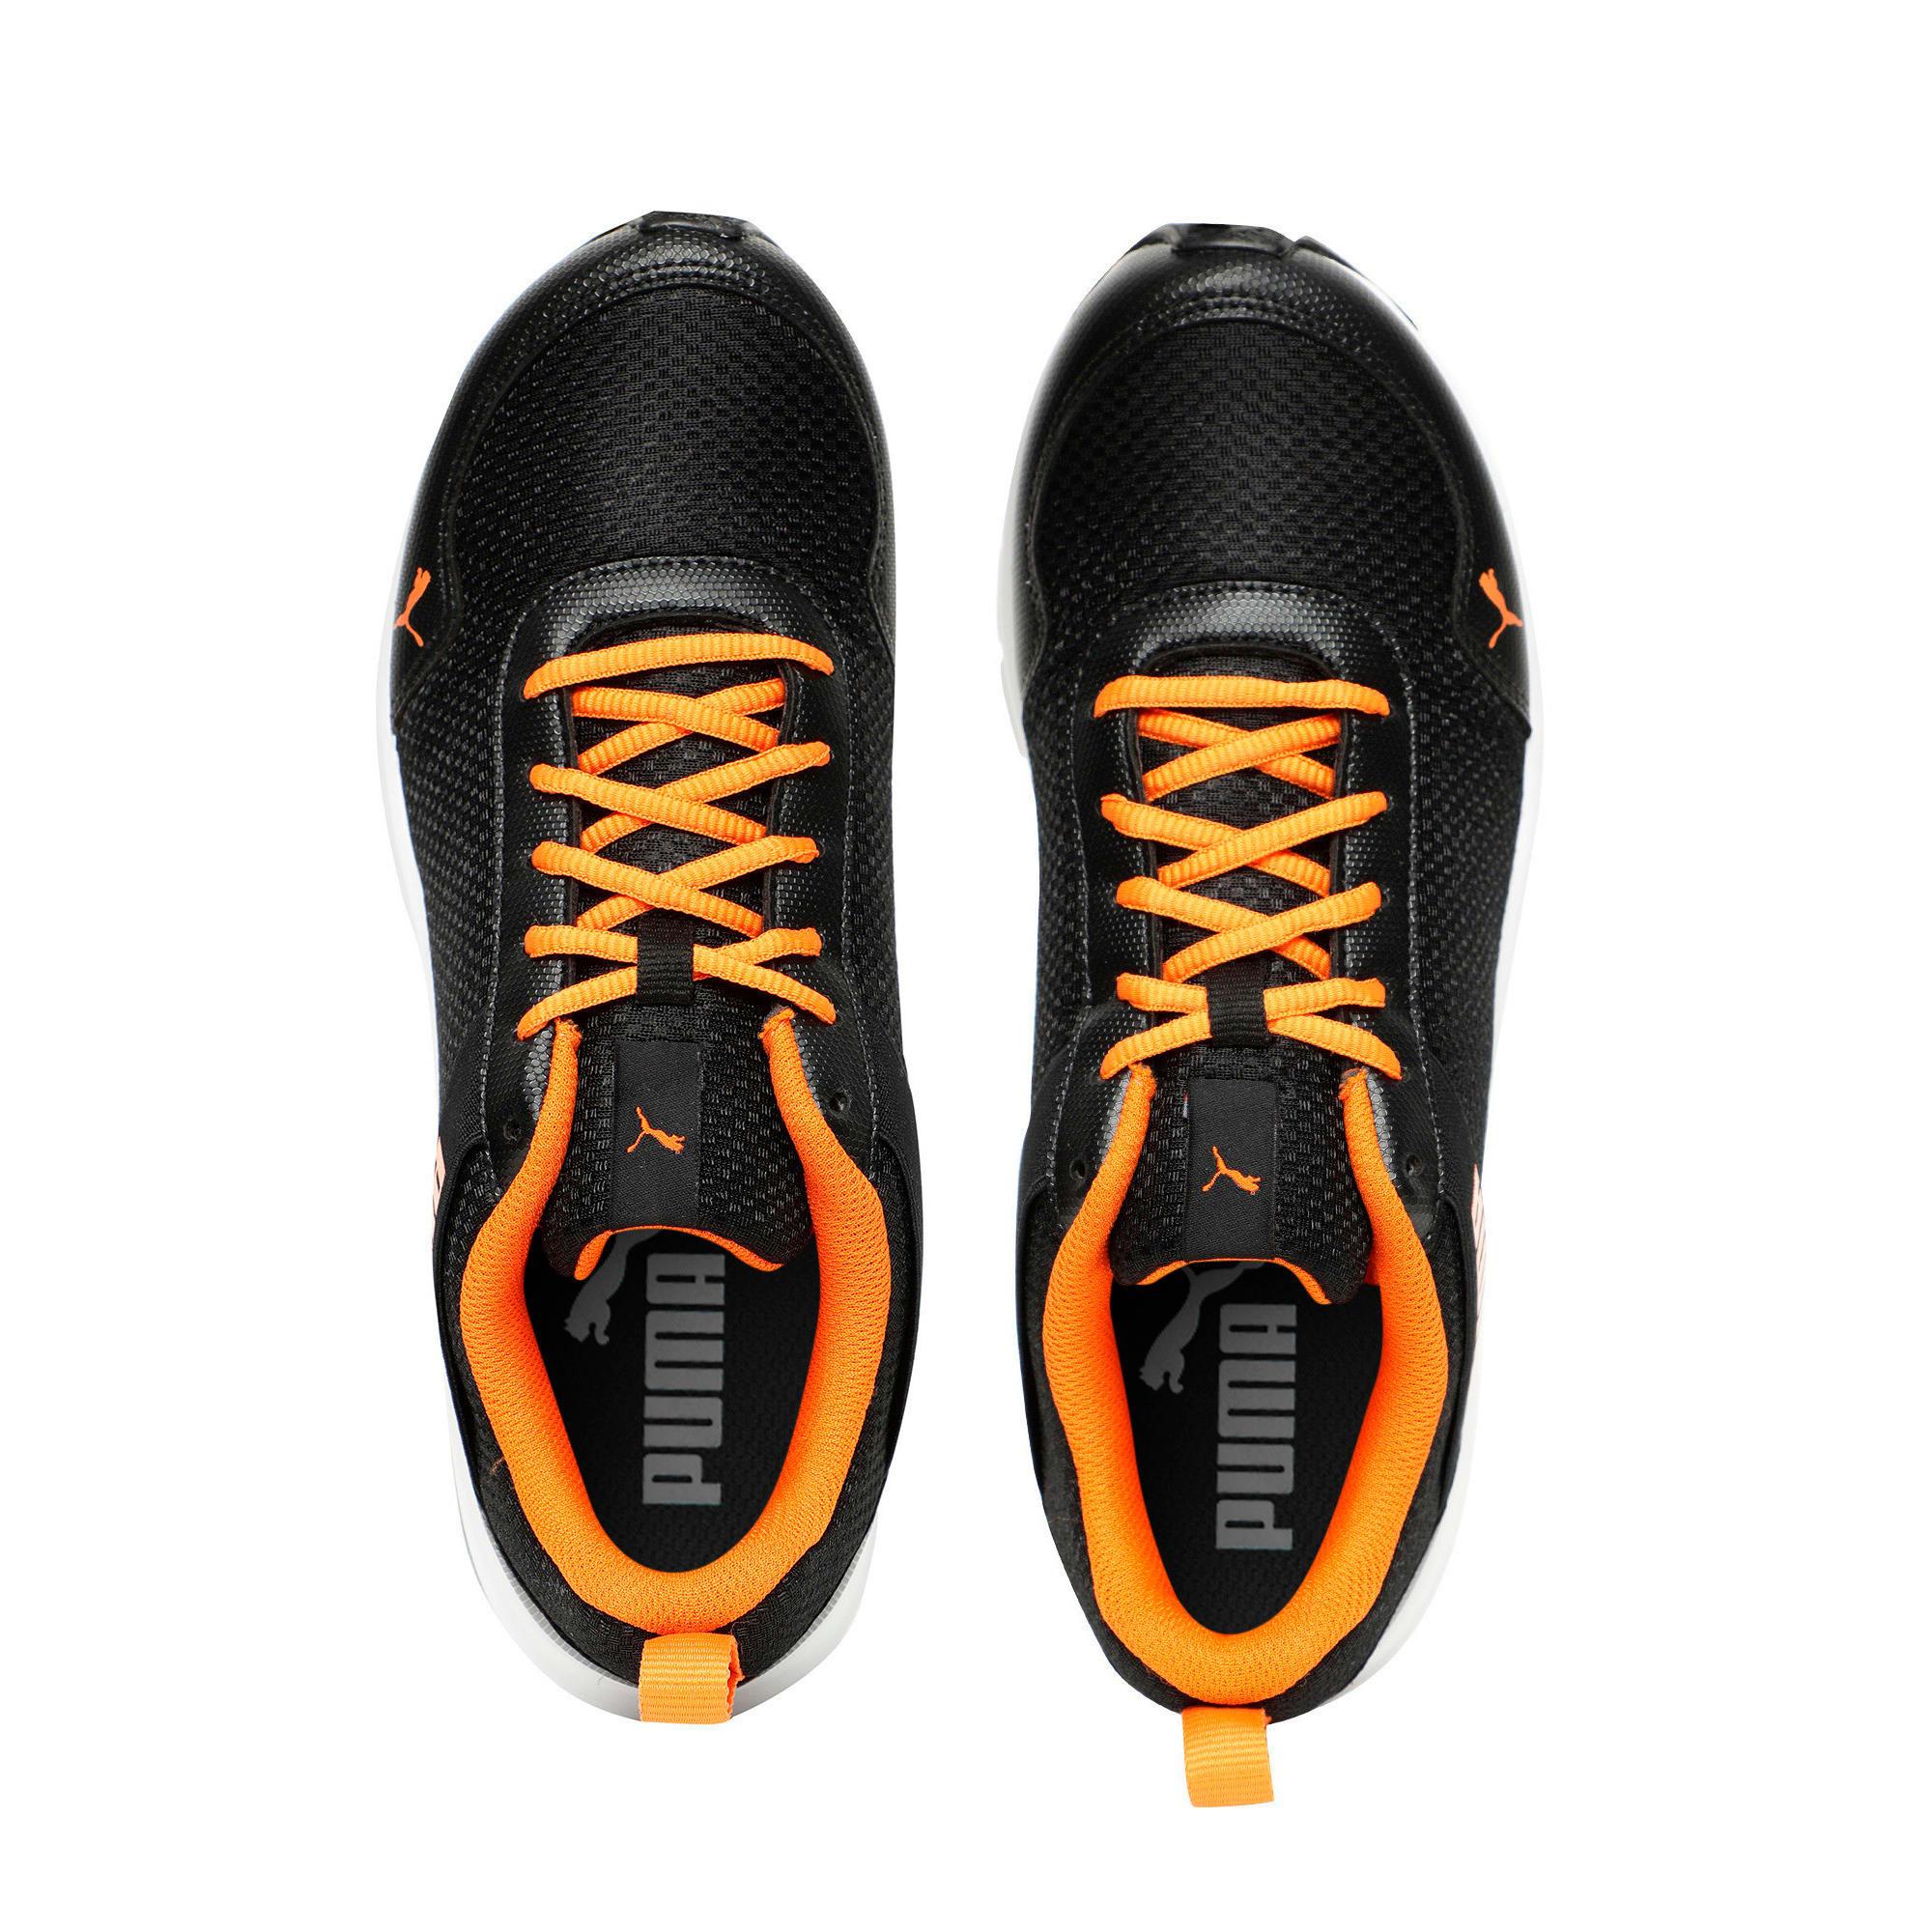 Thumbnail 5 of Movemax IDP Puma Black-Vibrant Orange, Puma Black-Vibrant Orange, medium-IND